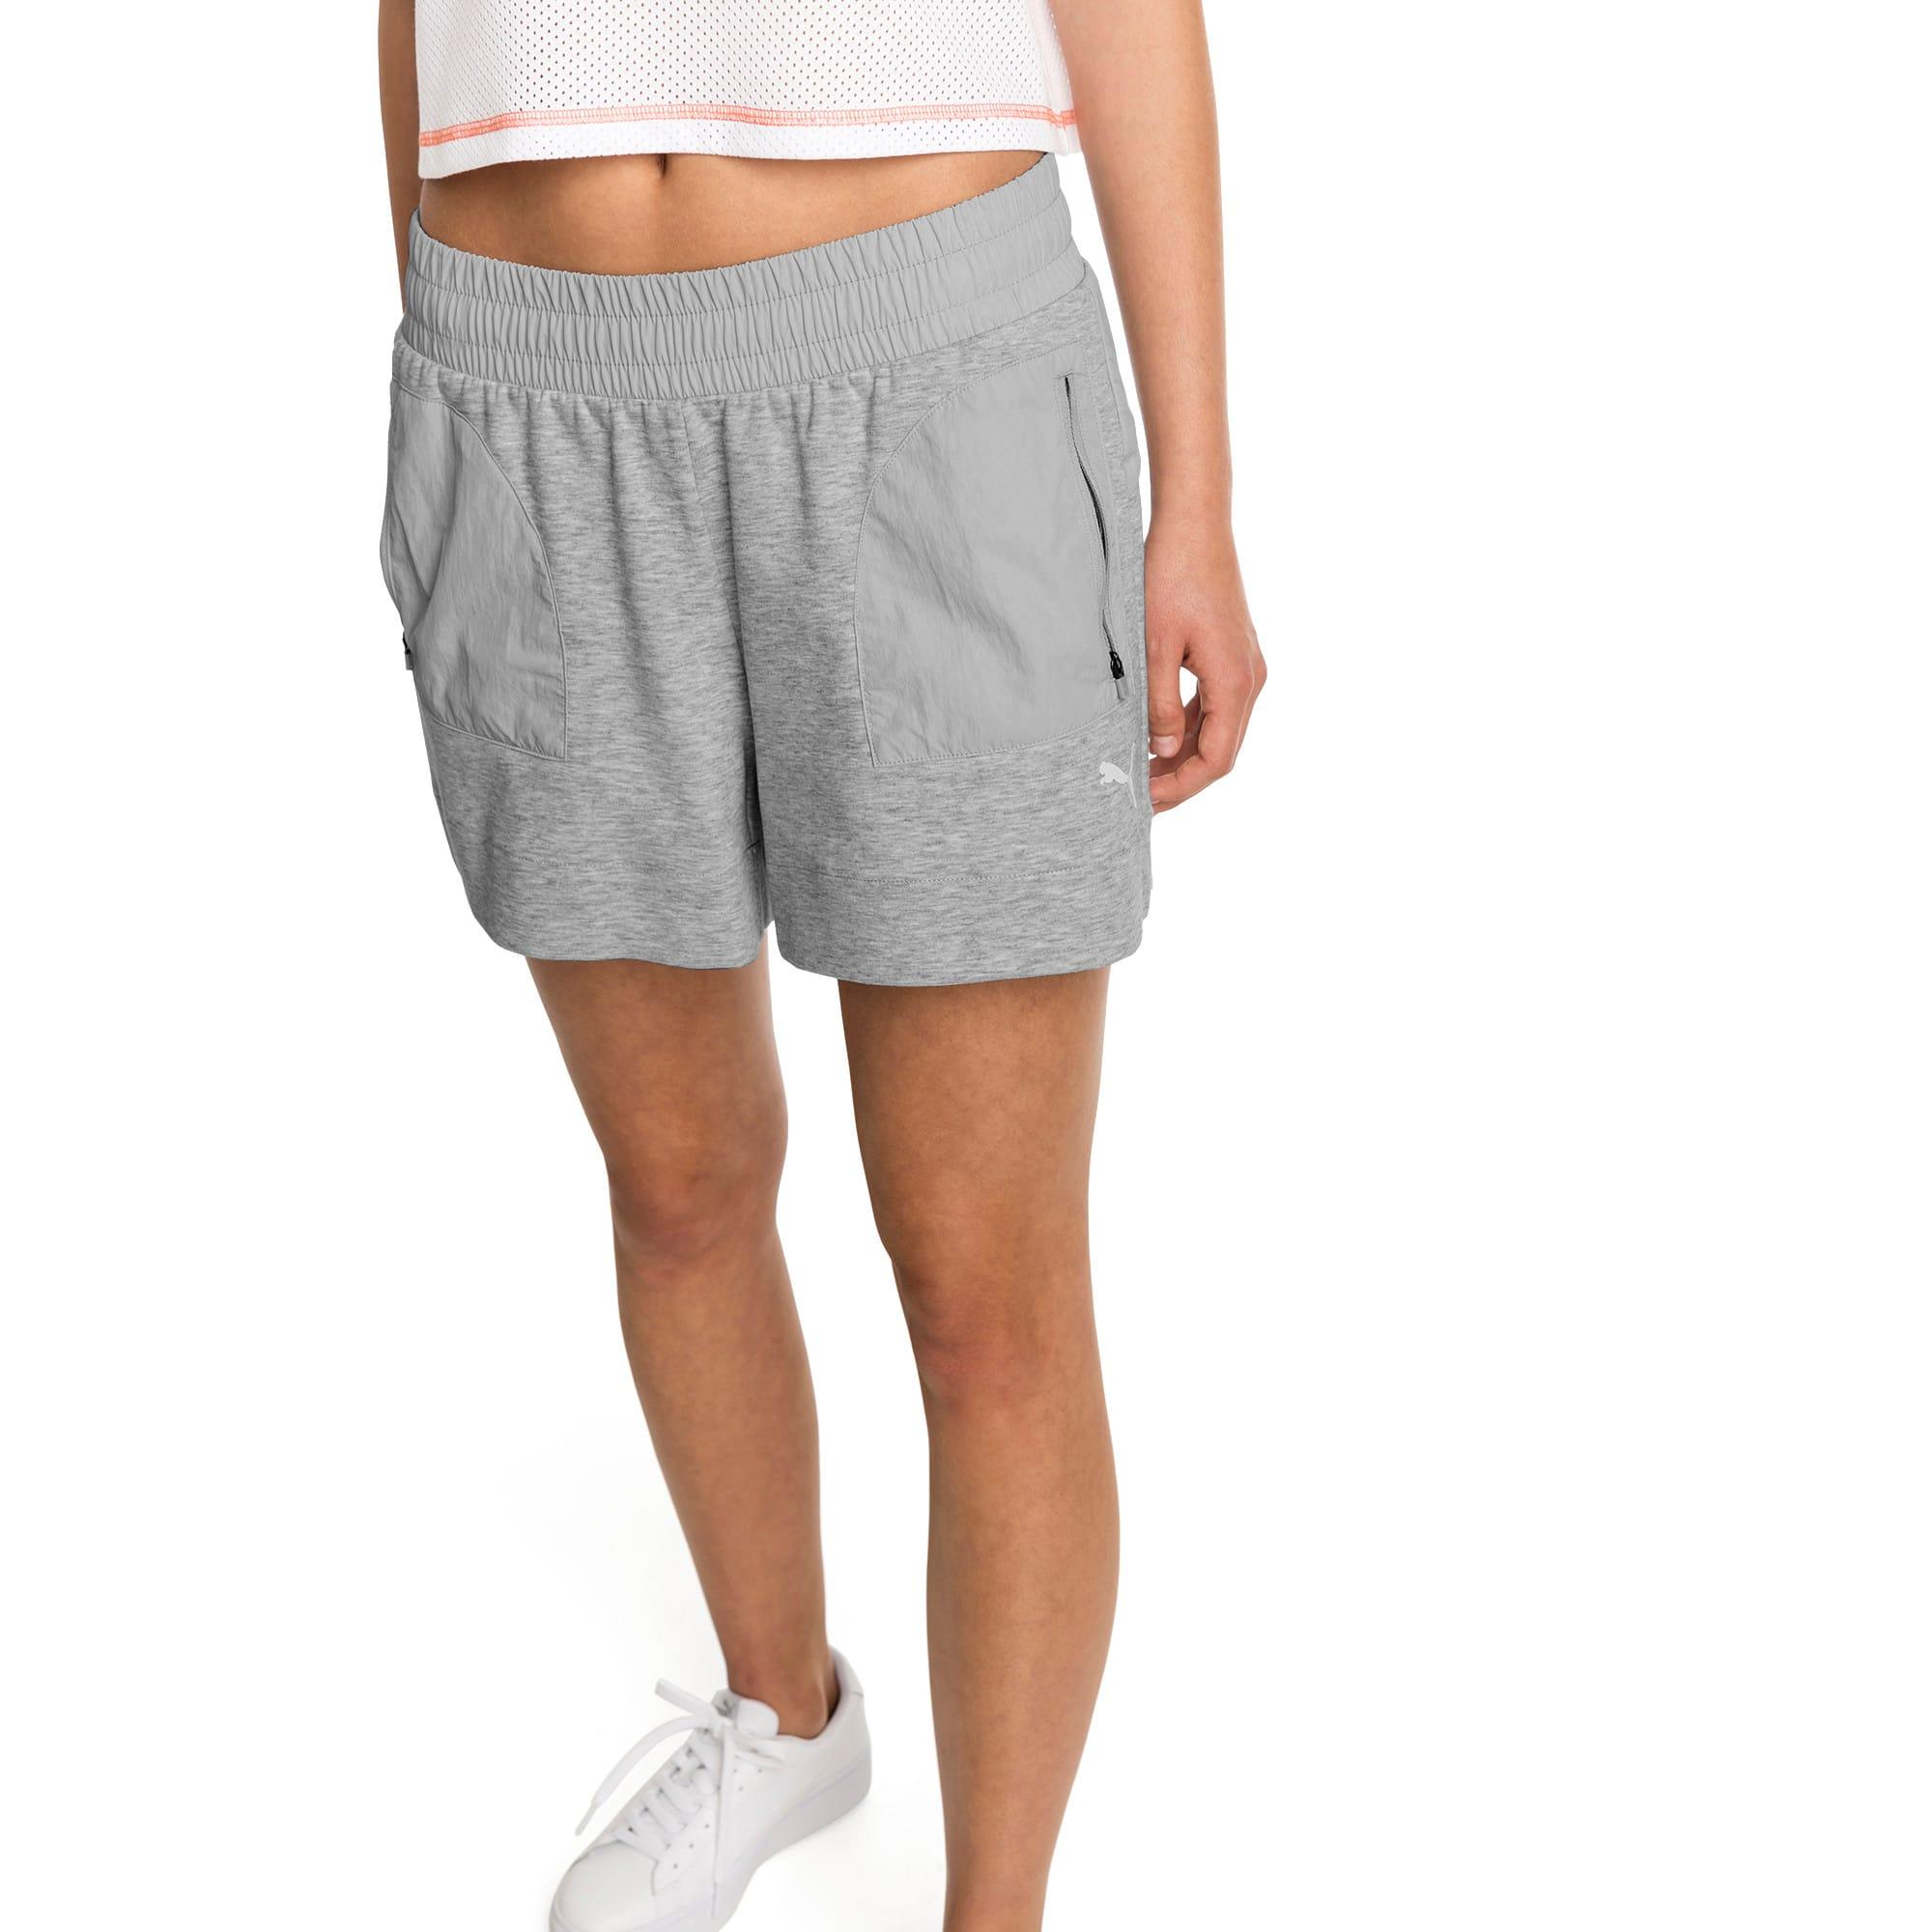 Thumbnail 1 of Evostripe Lite Women's Shorts, Light Gray Heather, medium